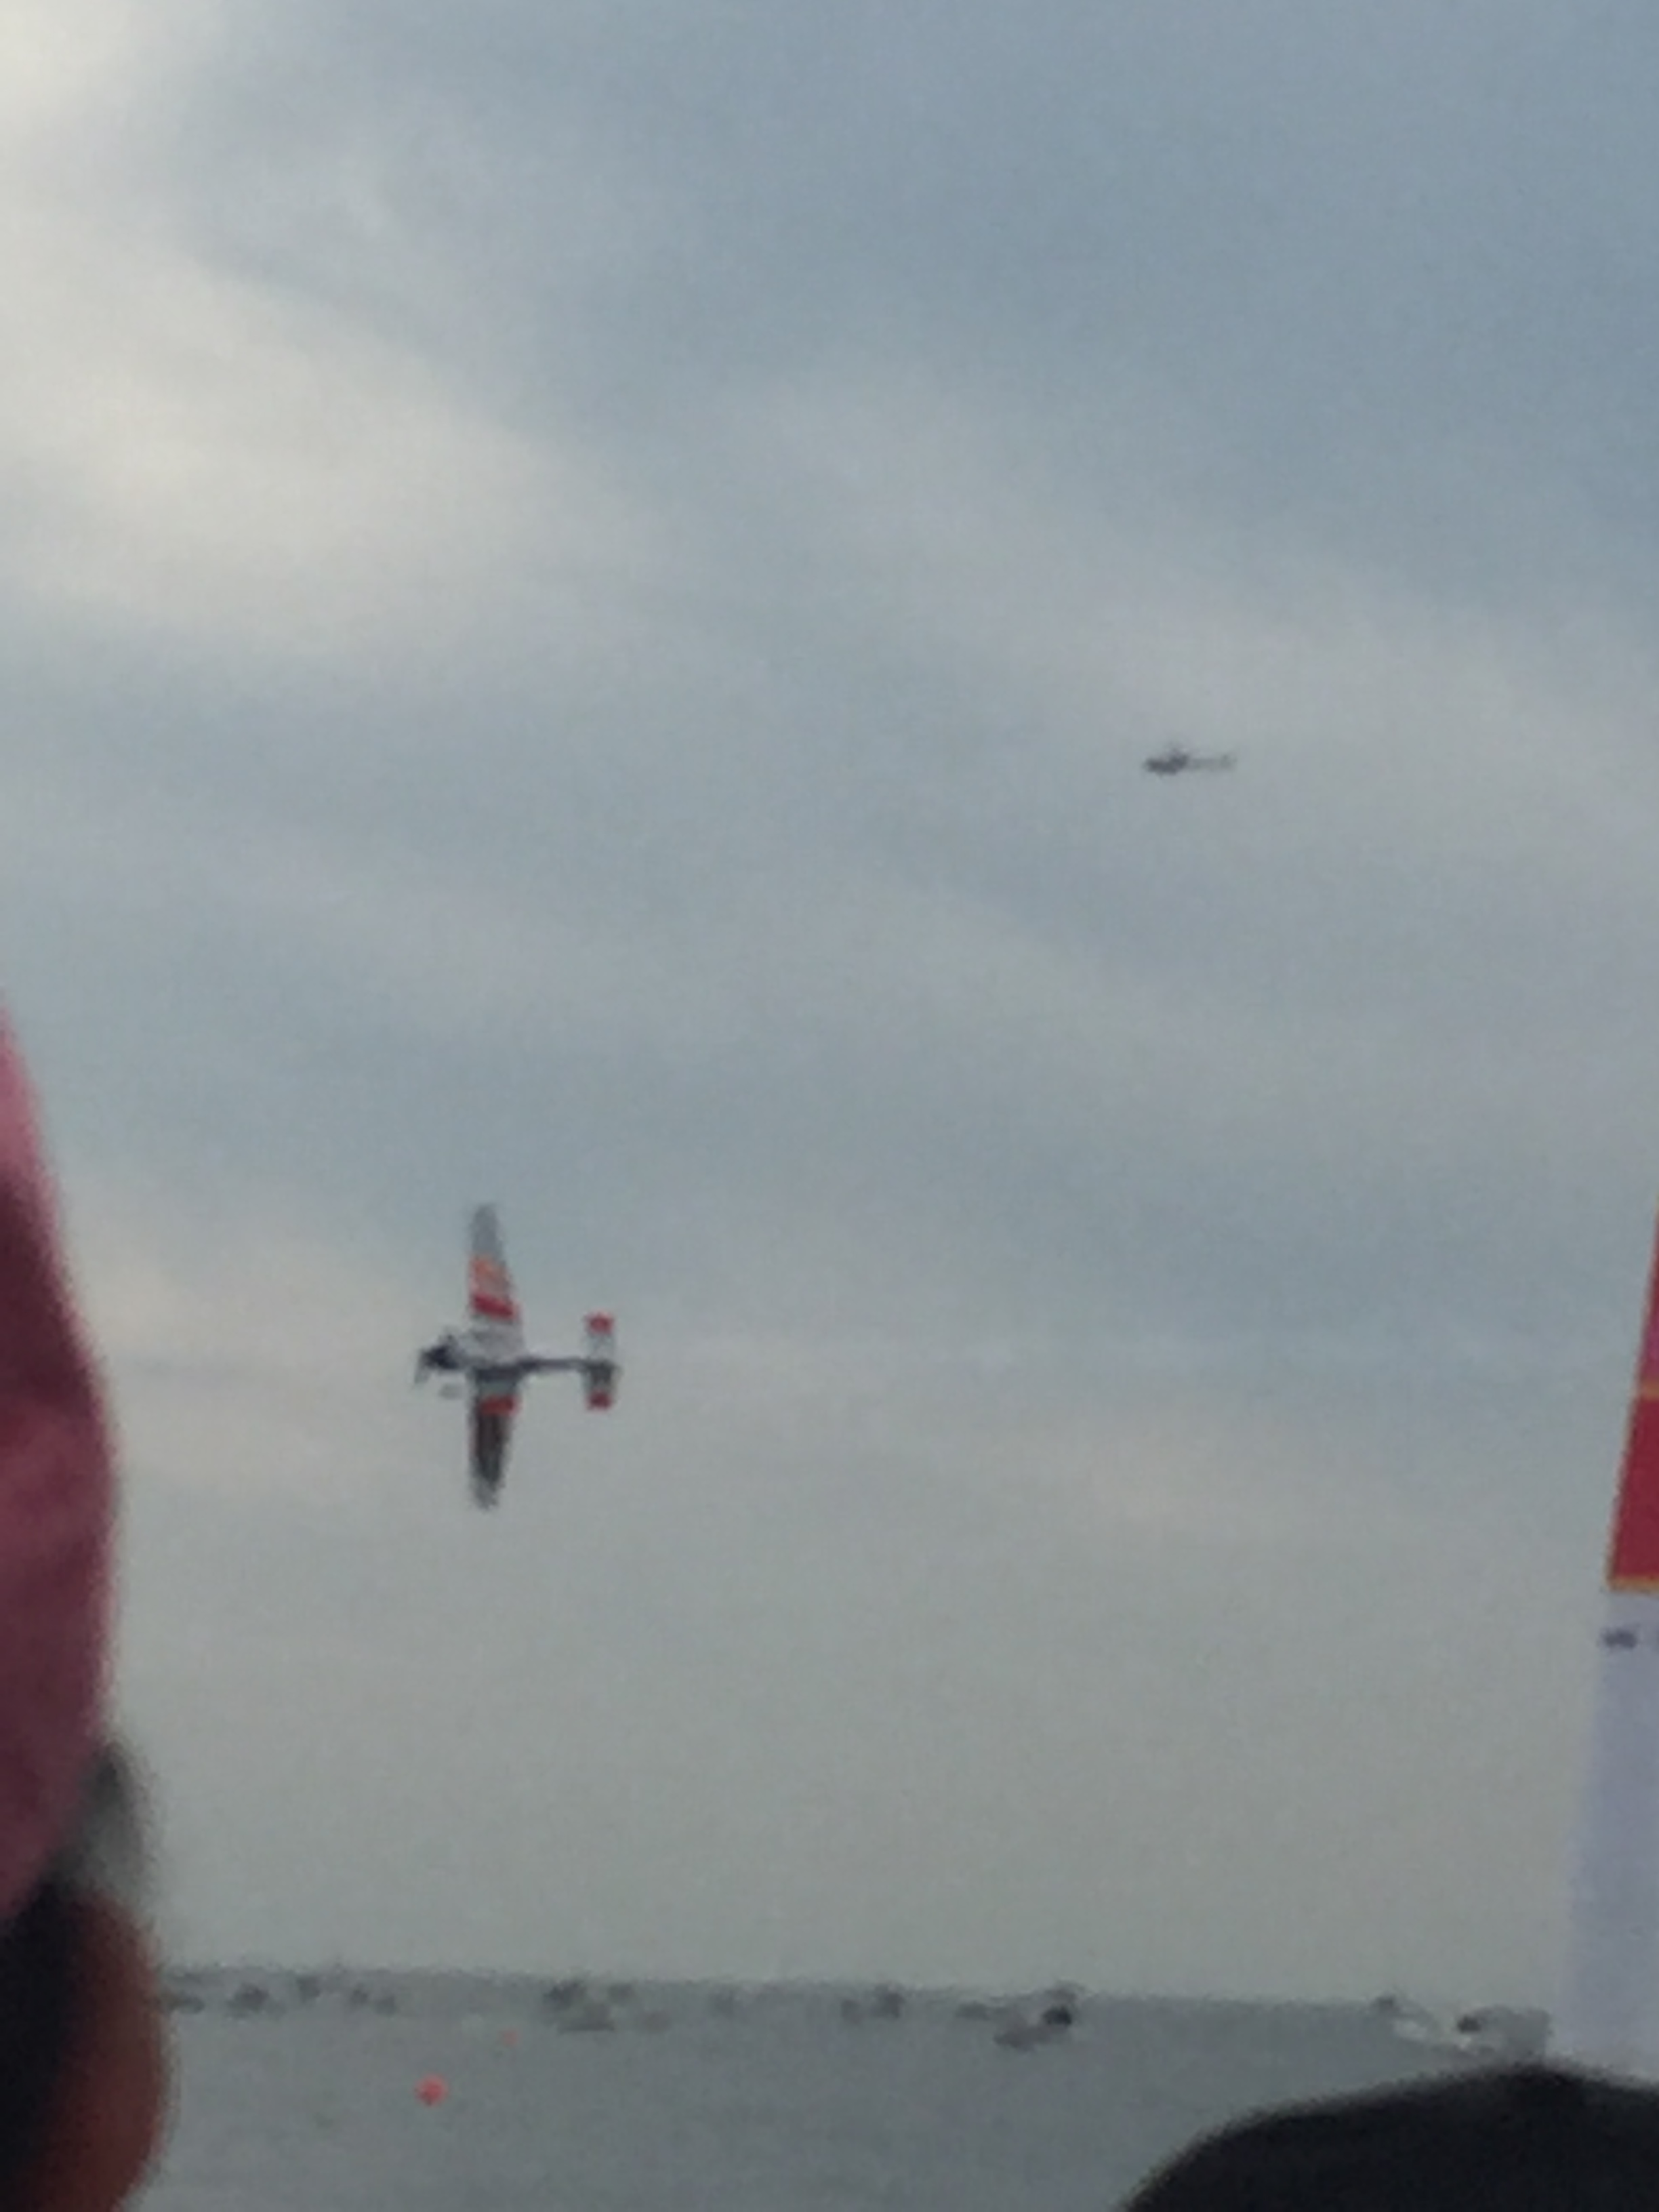 Red Bull Air race in 千葉、室屋選手がエアレース1位を初めて獲得@幕張